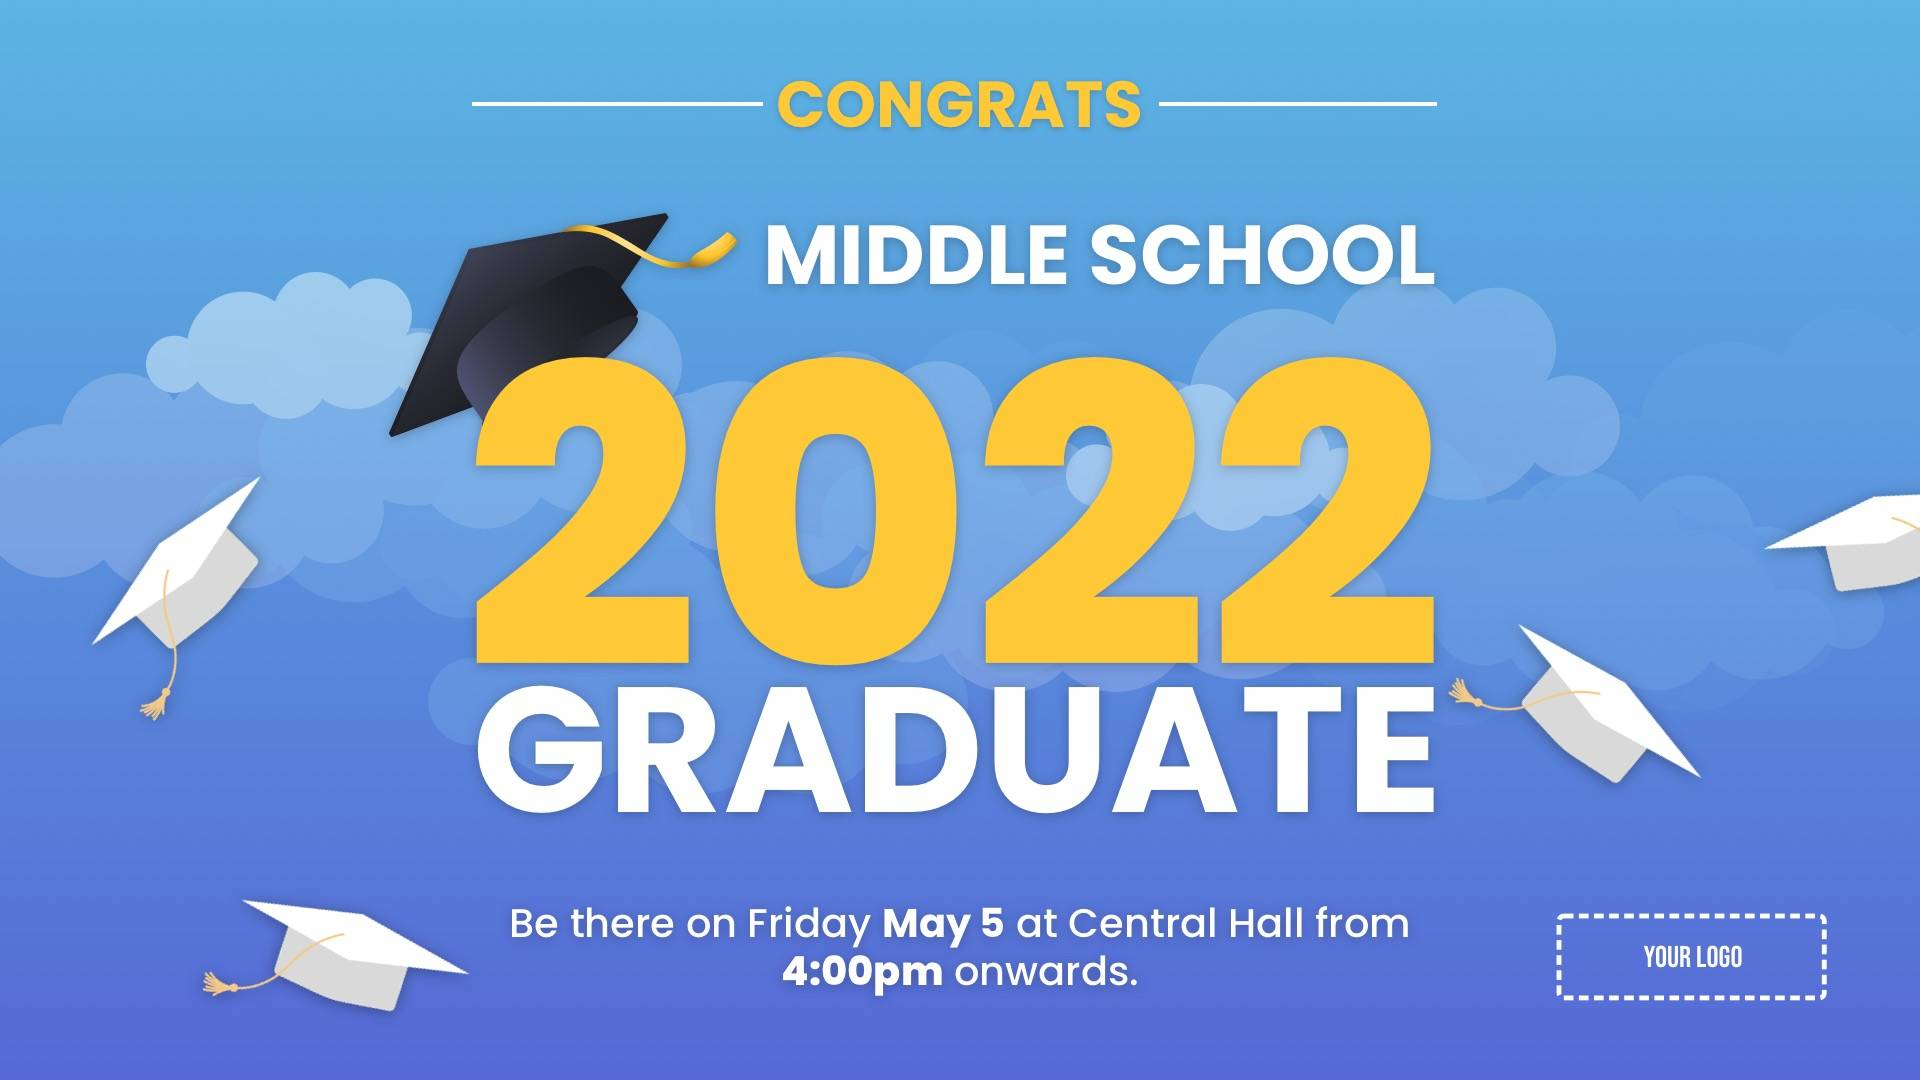 Graduation Announcement Digital Signage Template